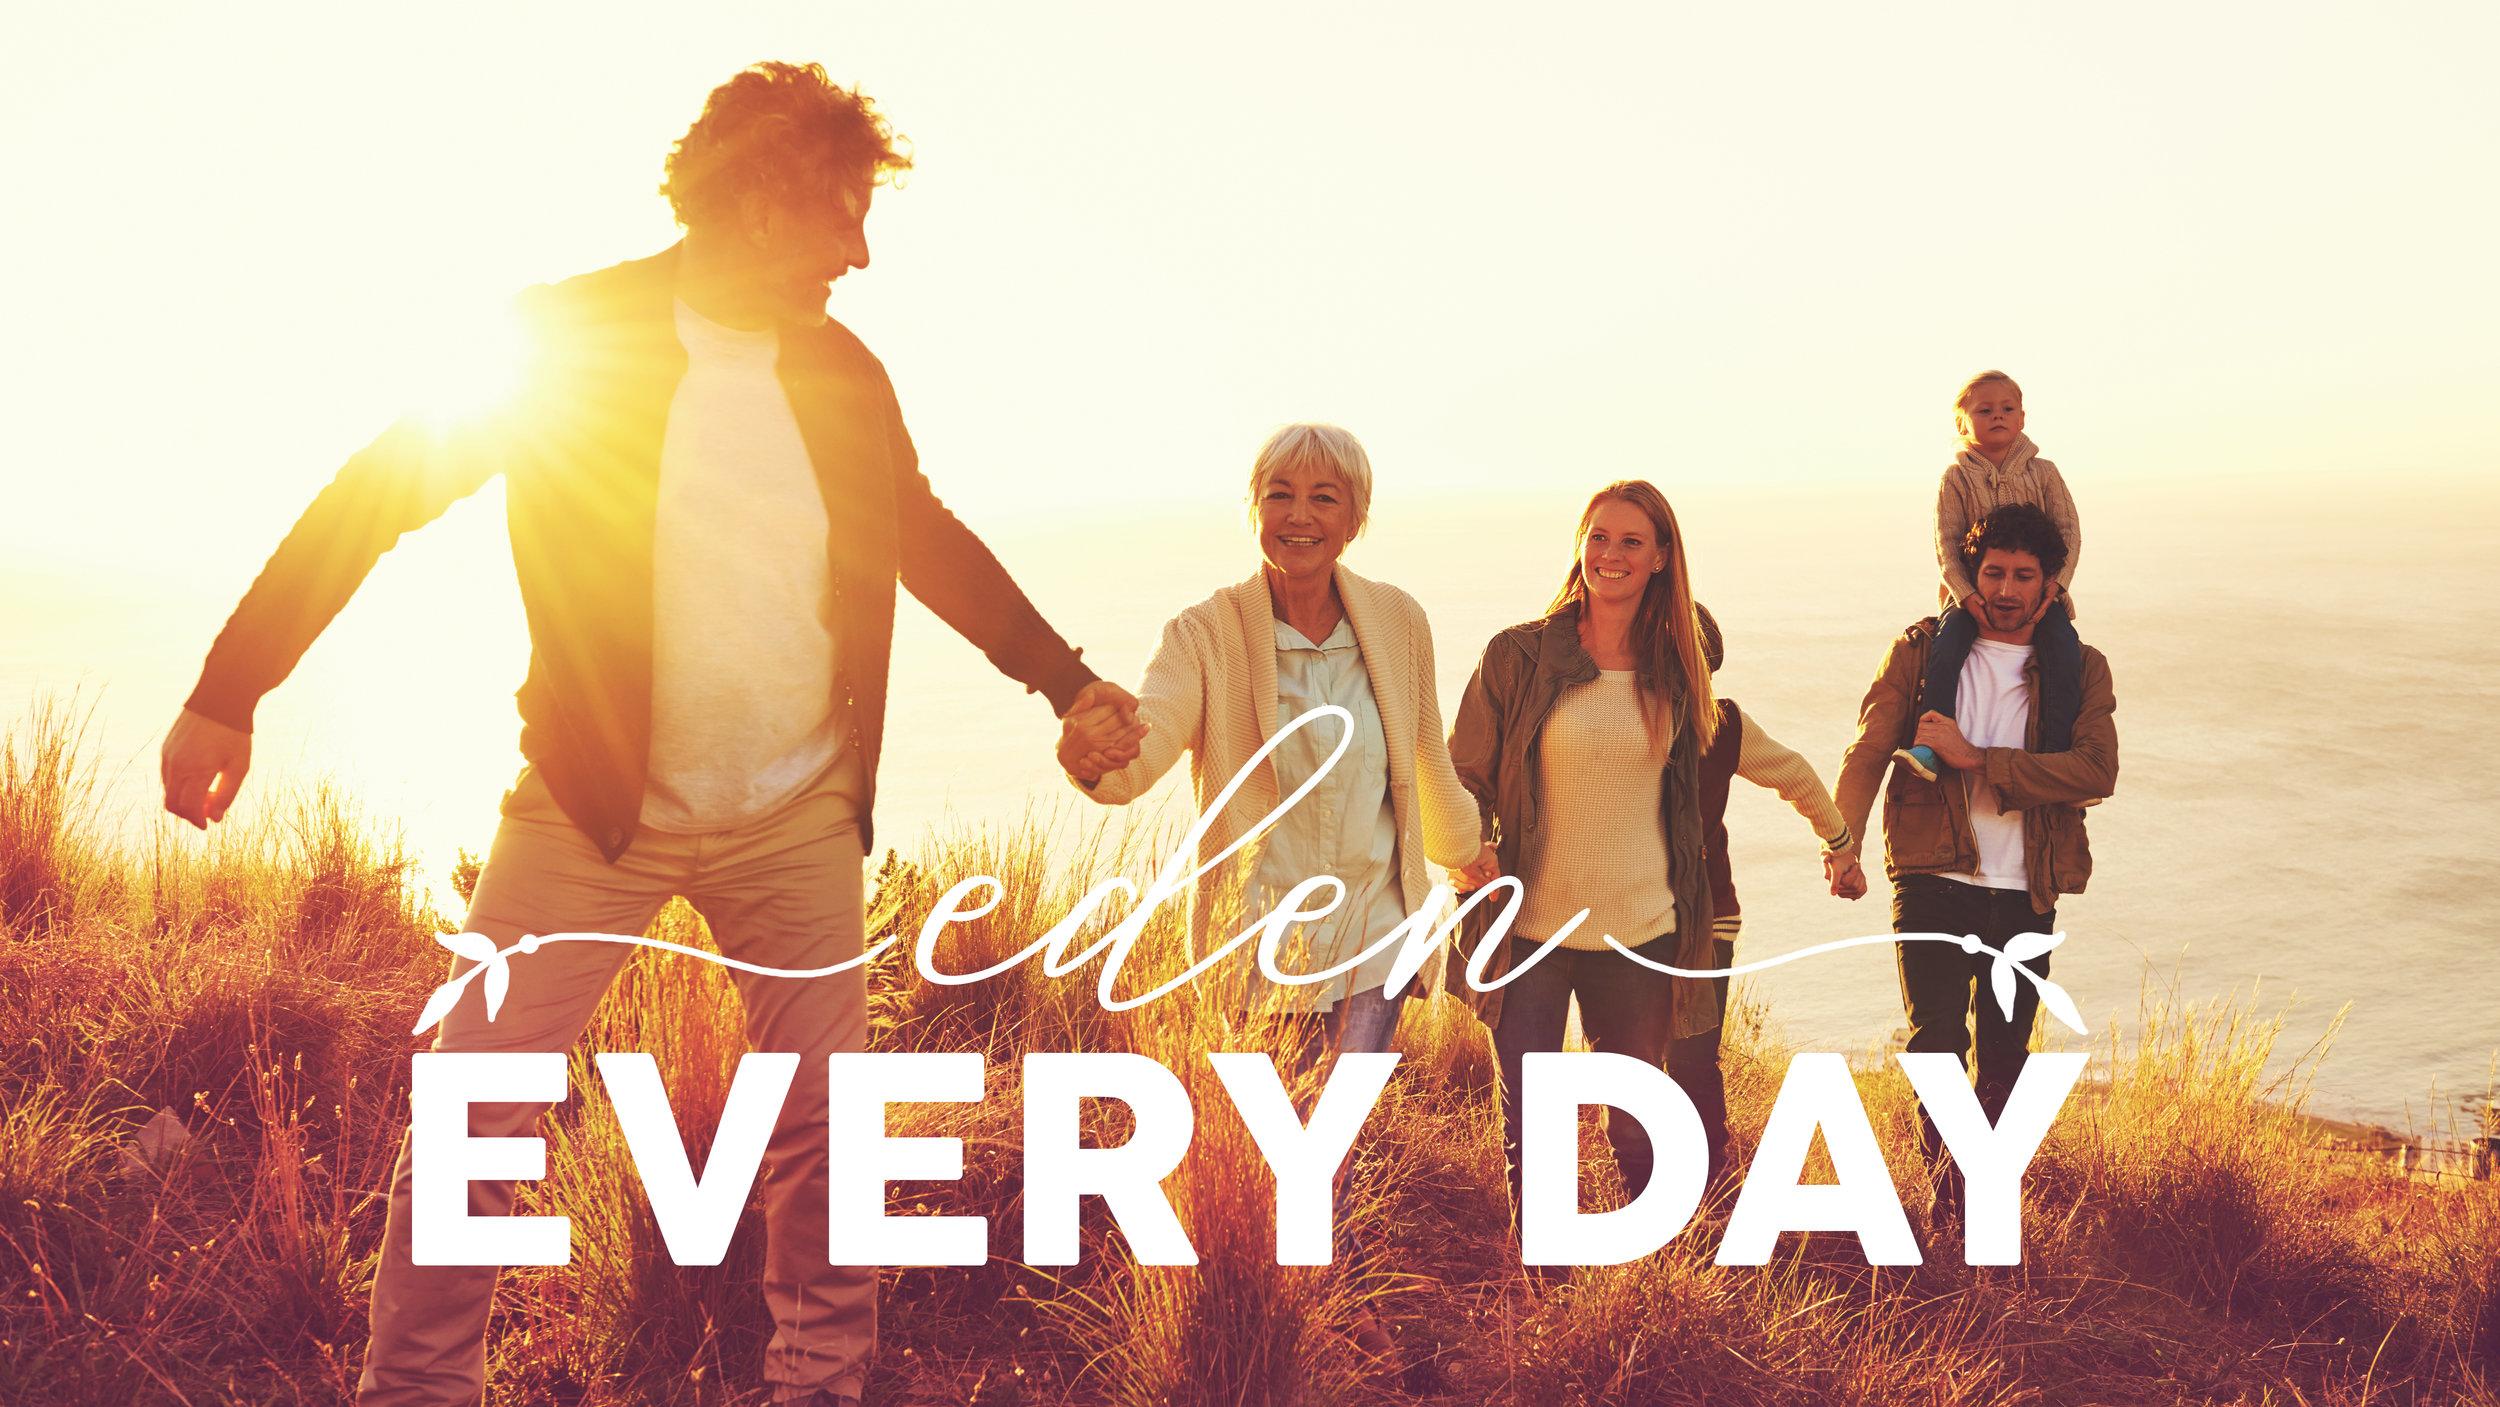 Eden Every Day2.jpg